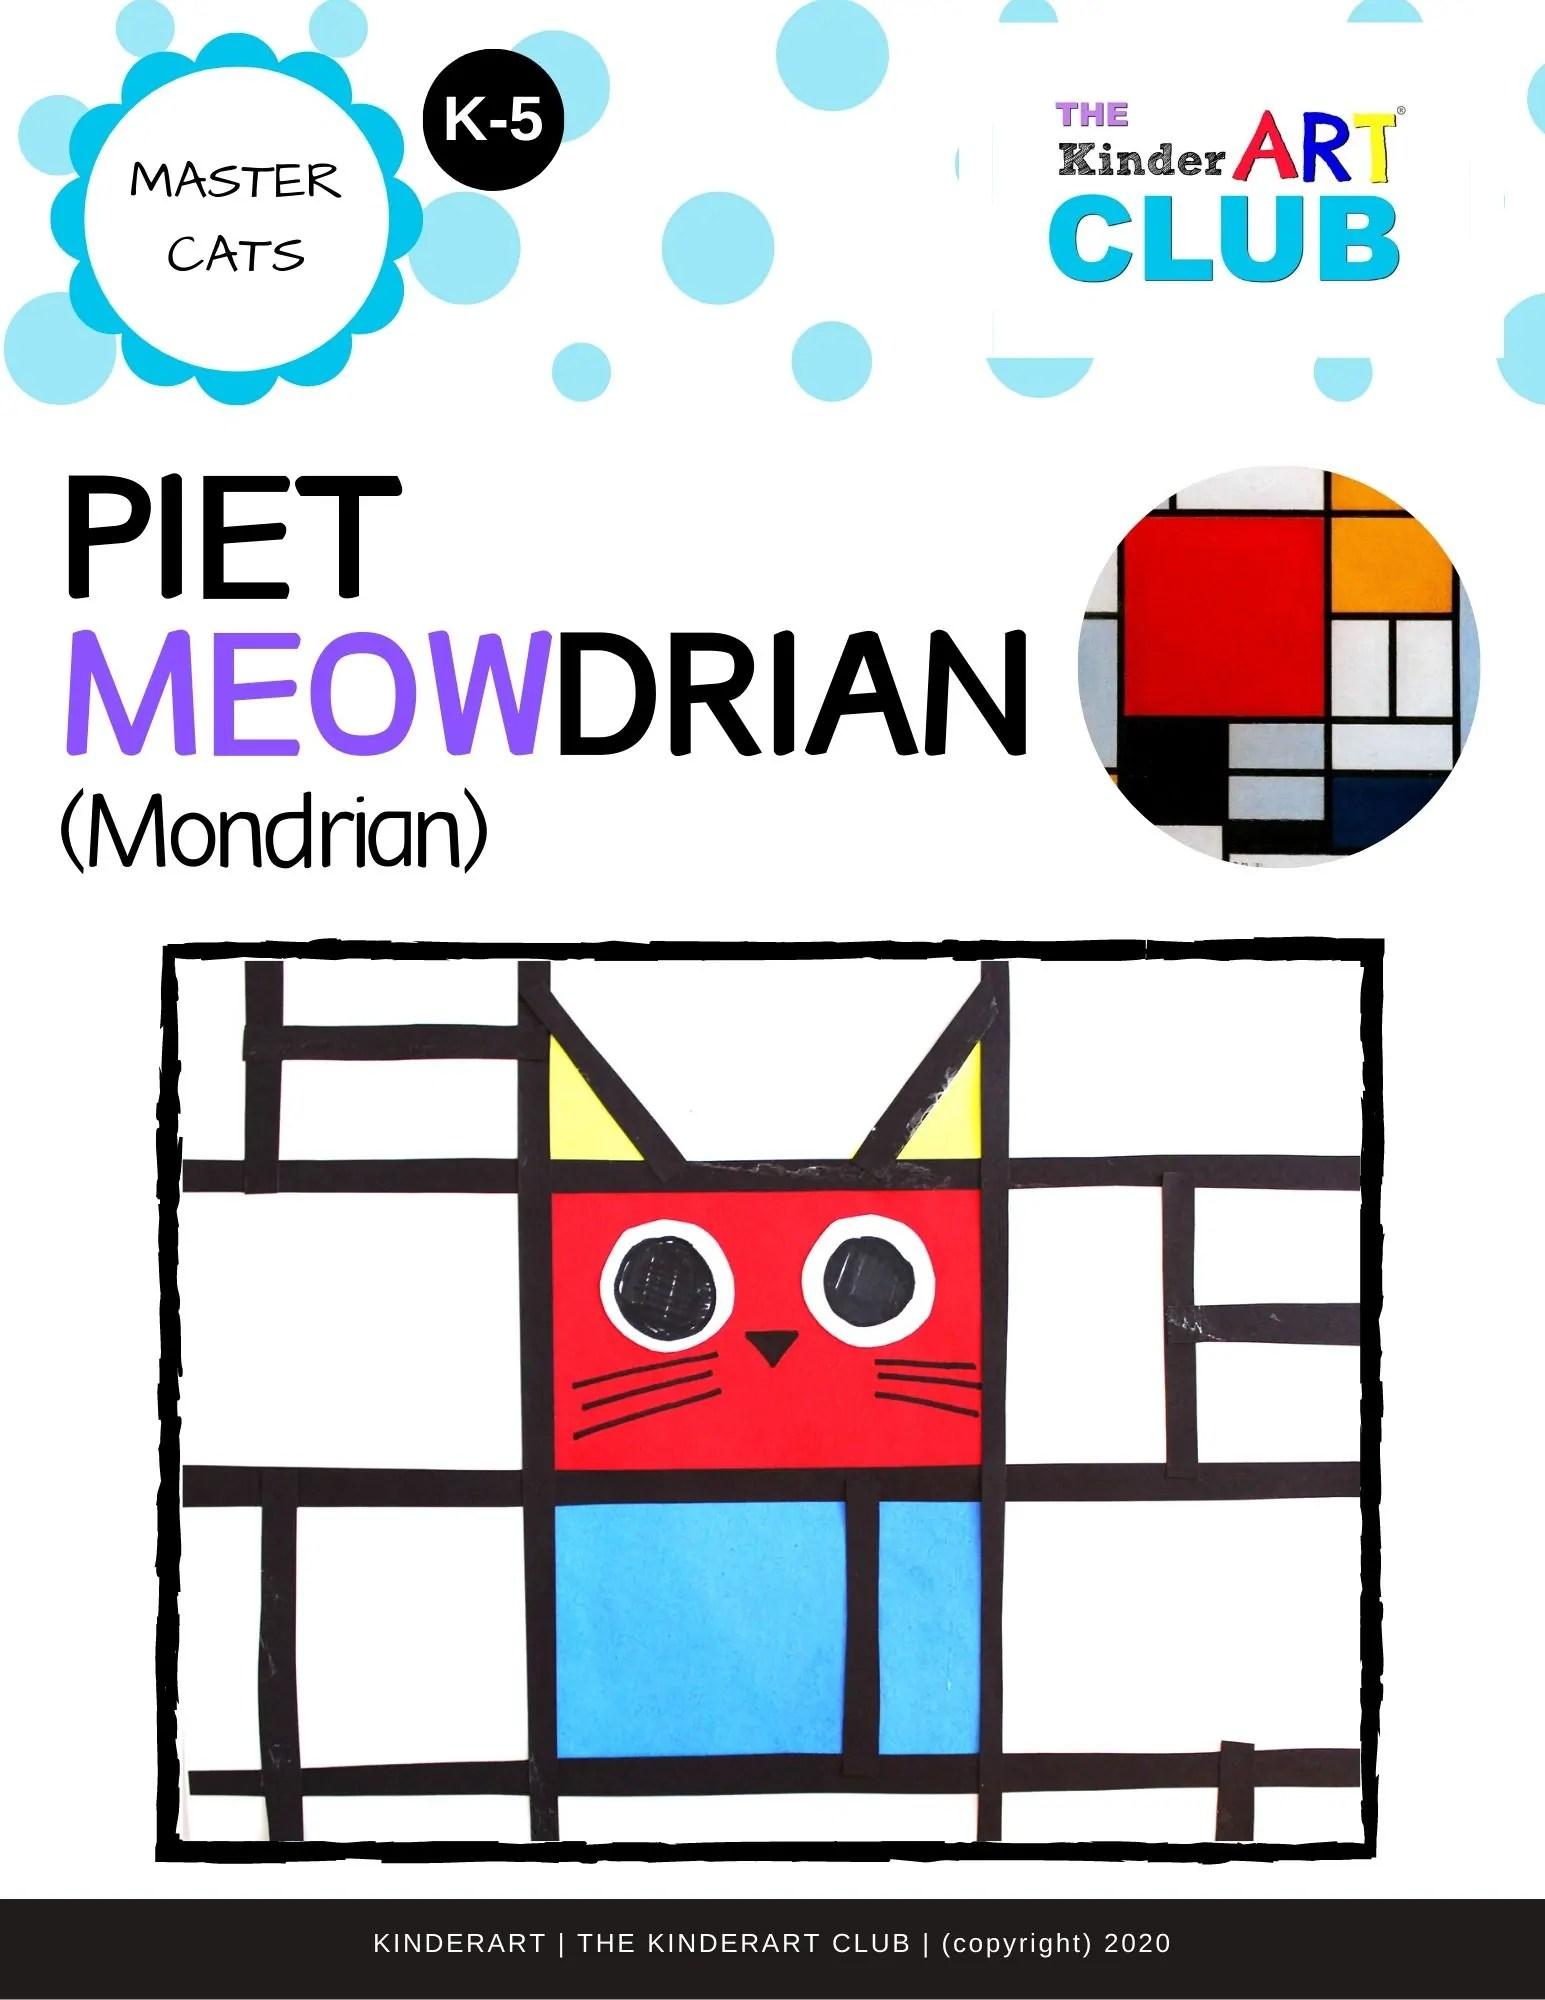 Lesson Piet Meowdrian Mondrian